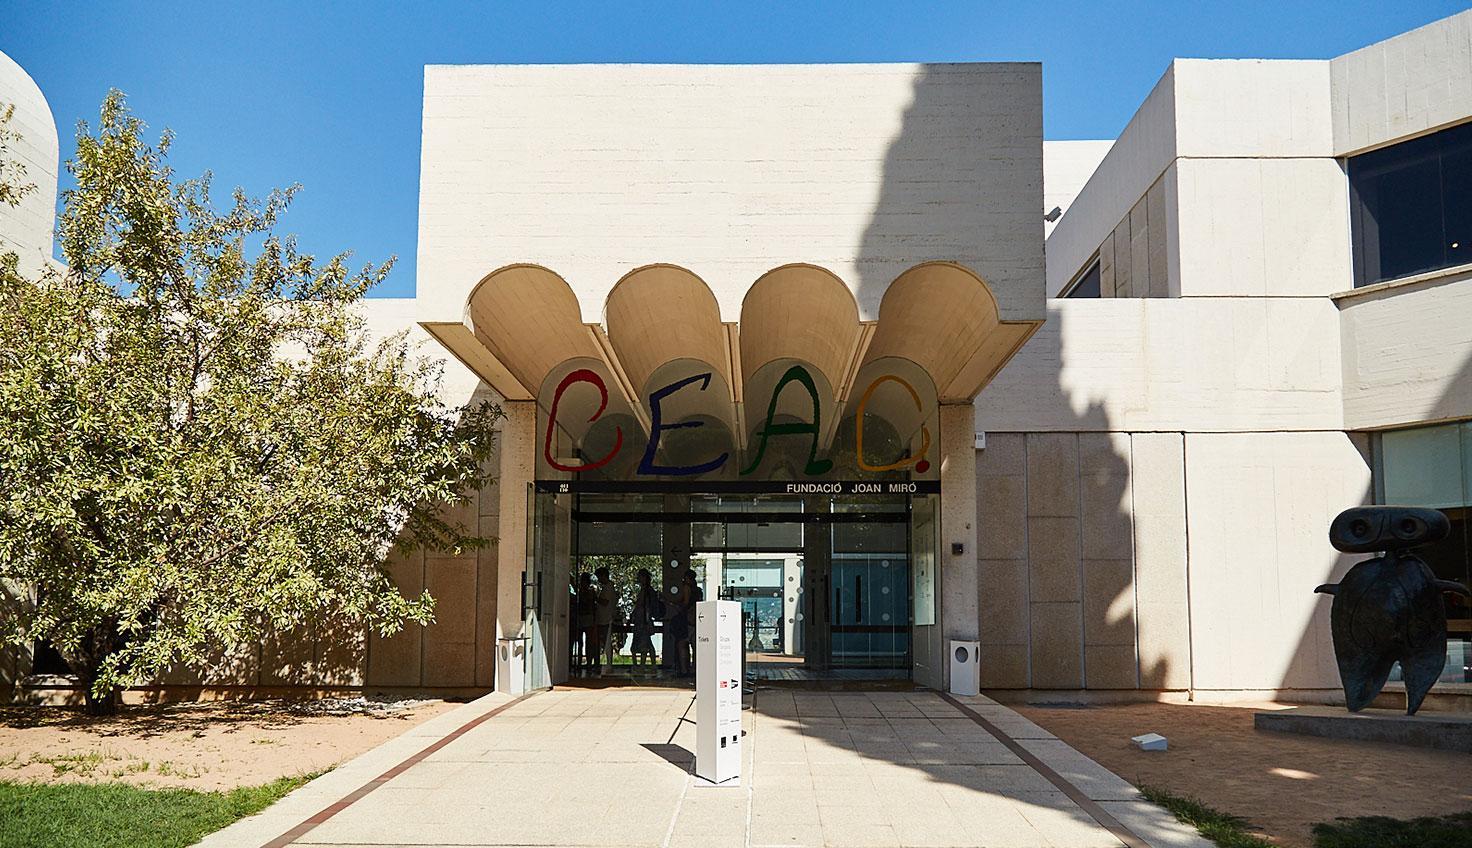 Photo Fondation Joan Miró Barcelona